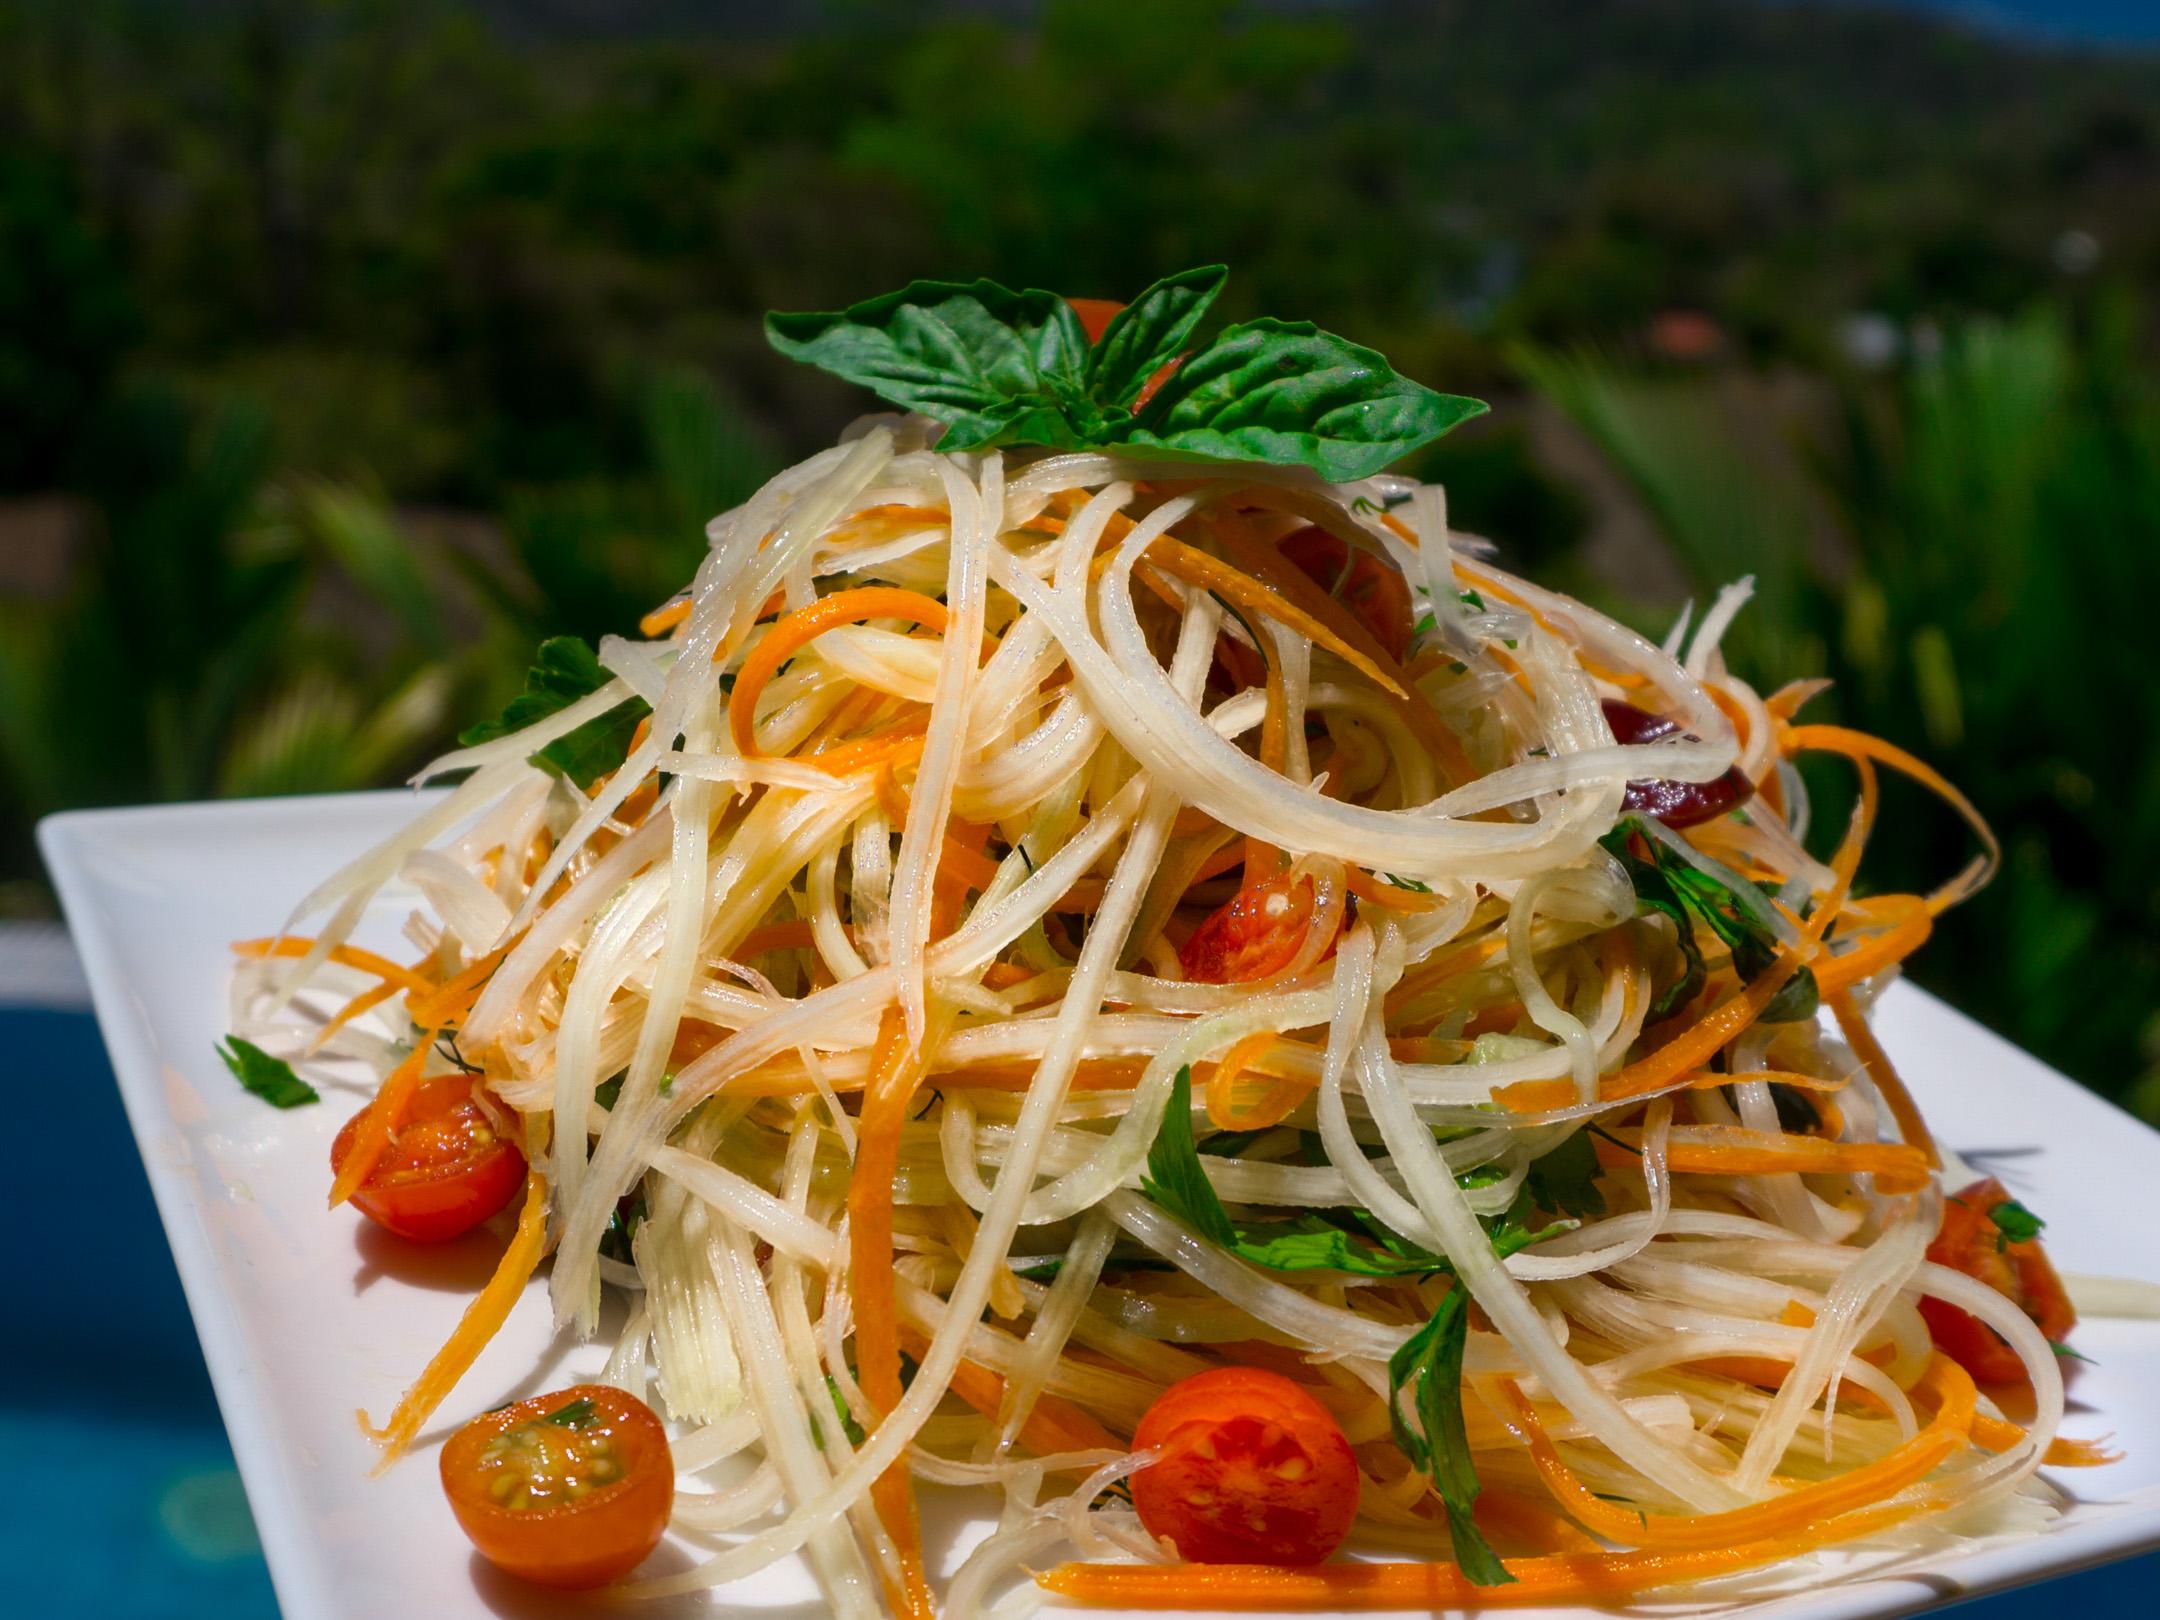 Papayasalat rohkost und vegan aus Costa Rica mit Sauerkraut.